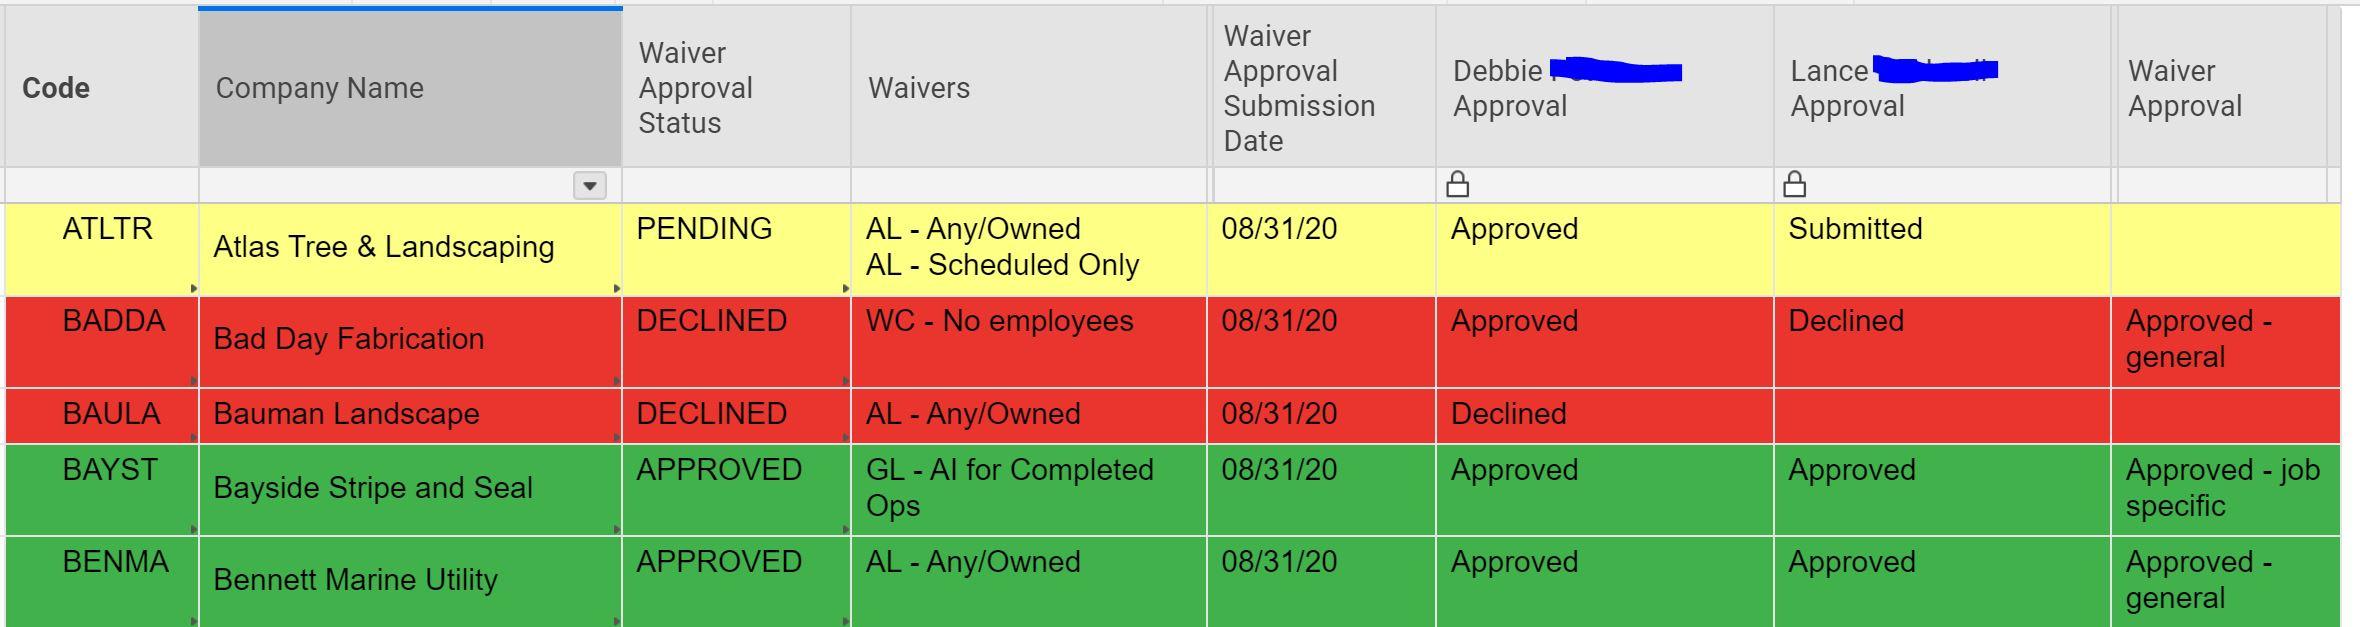 approvals sheet 2.JPG